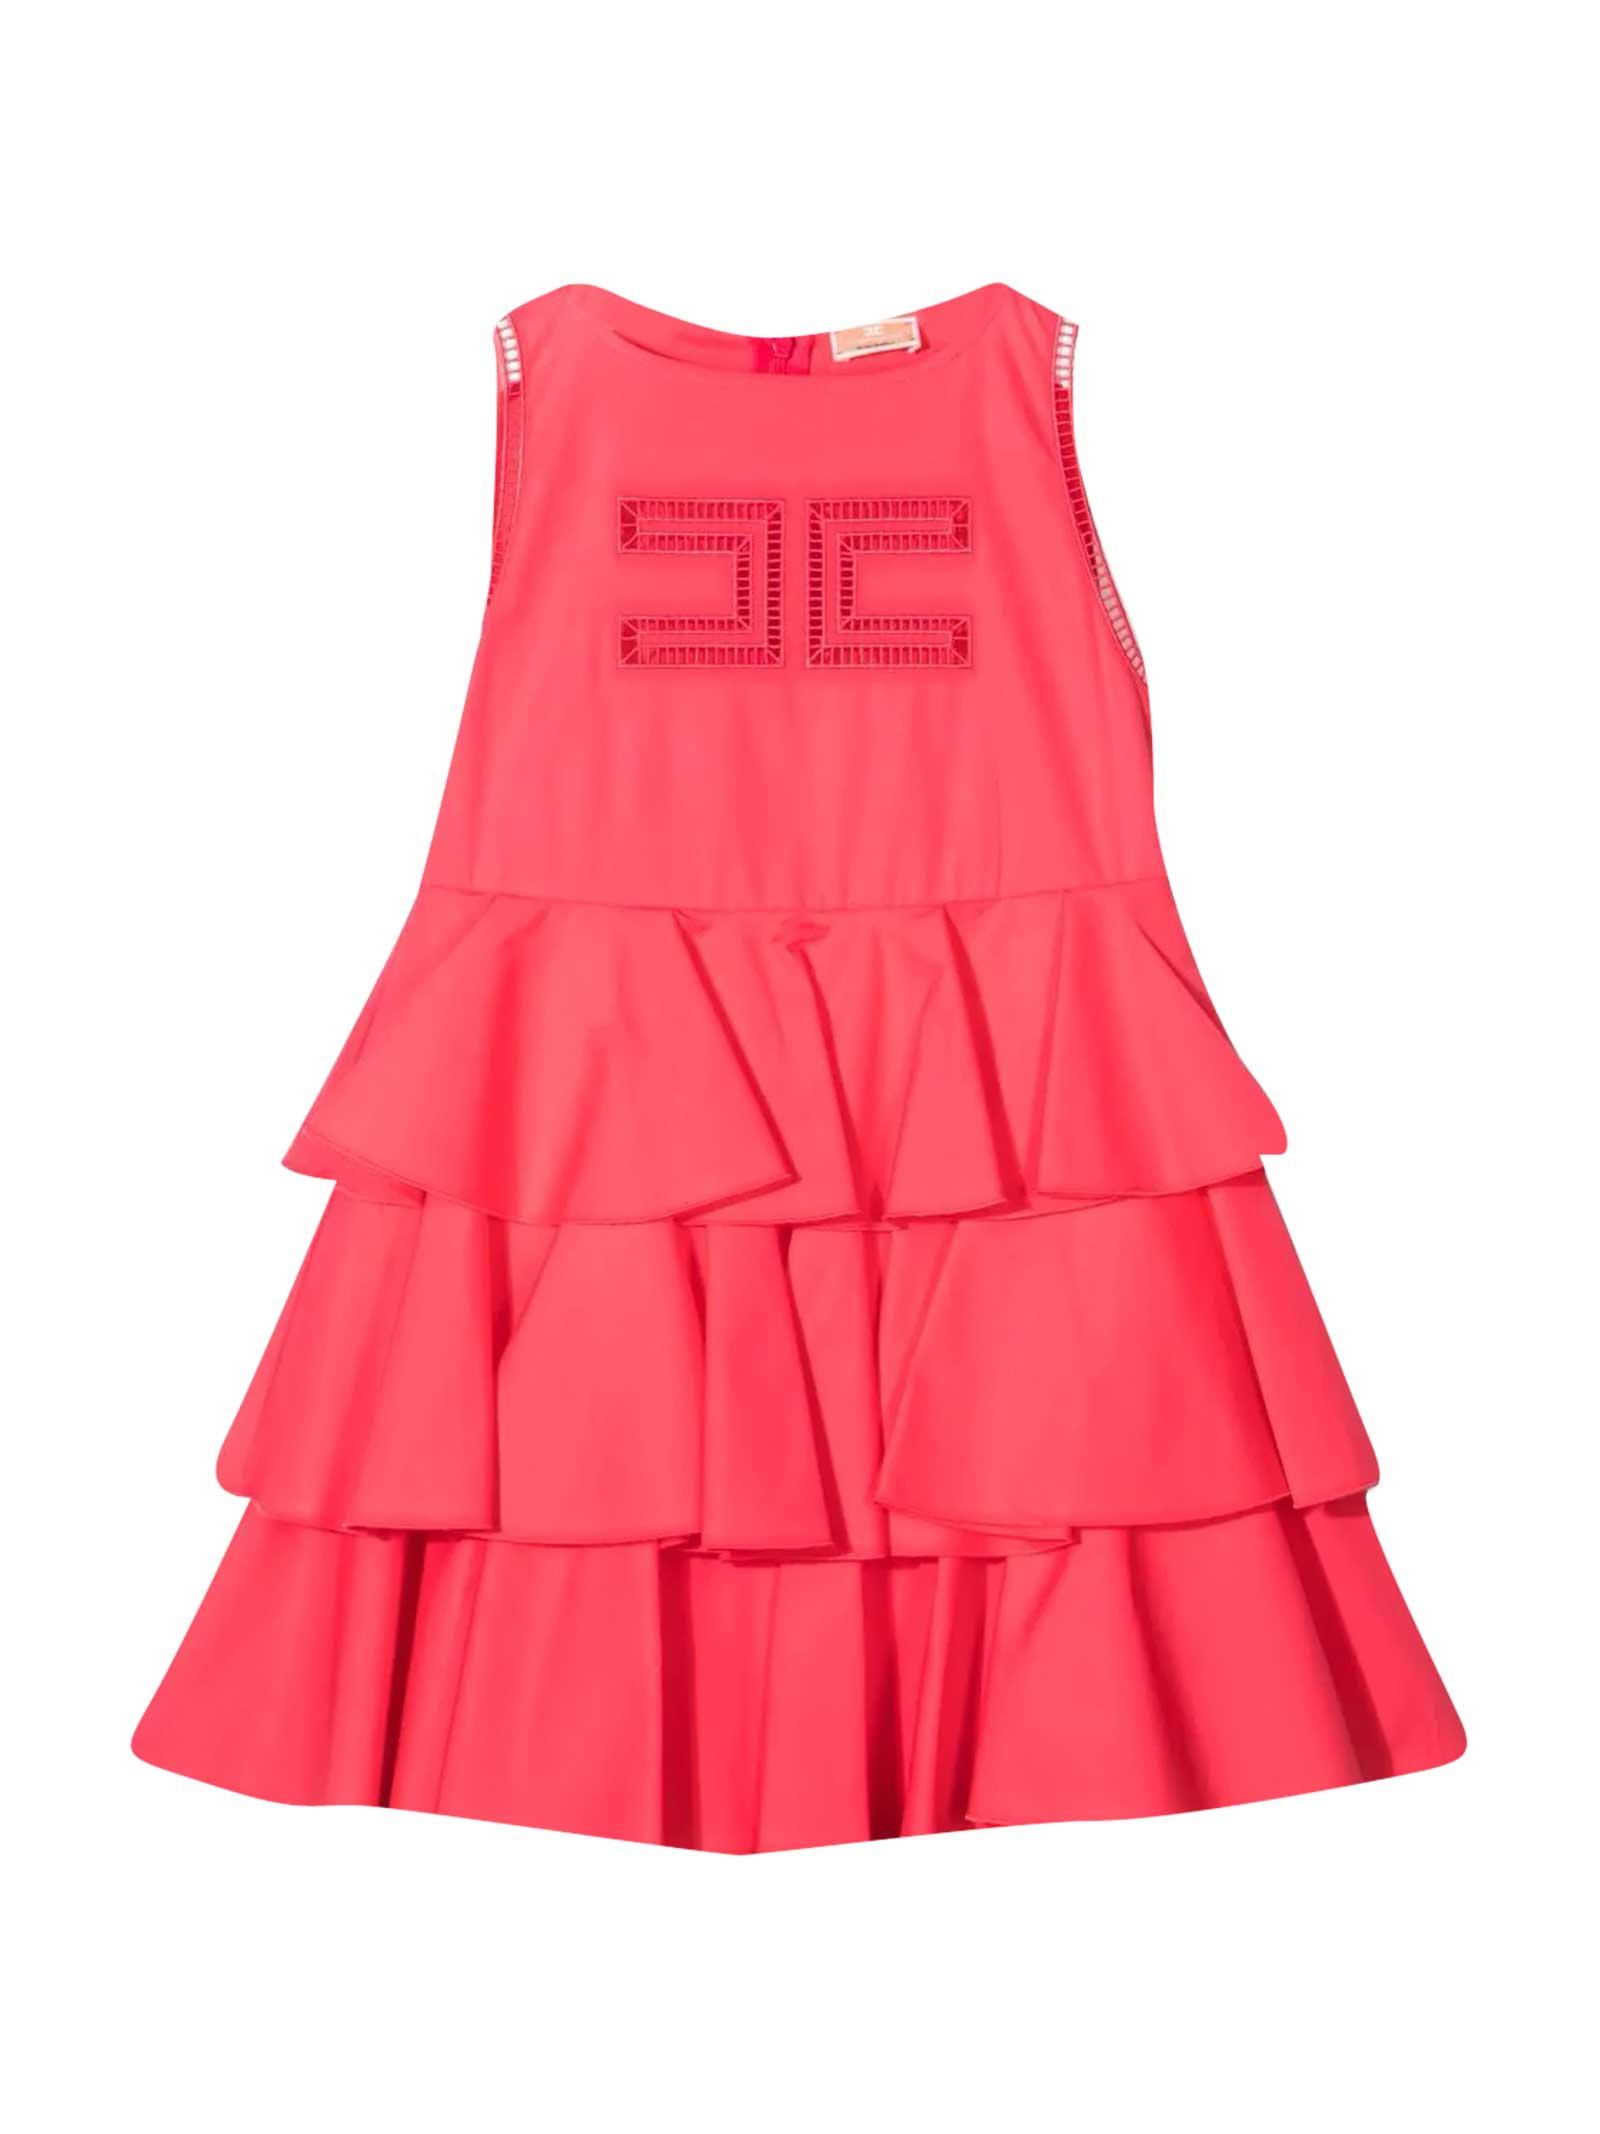 Buy Elisabetta Franchi La Mia Bambina Dress With Elisabetta Franchi My Girl Logo online, shop Elisabetta Franchi La Mia Bambina with free shipping